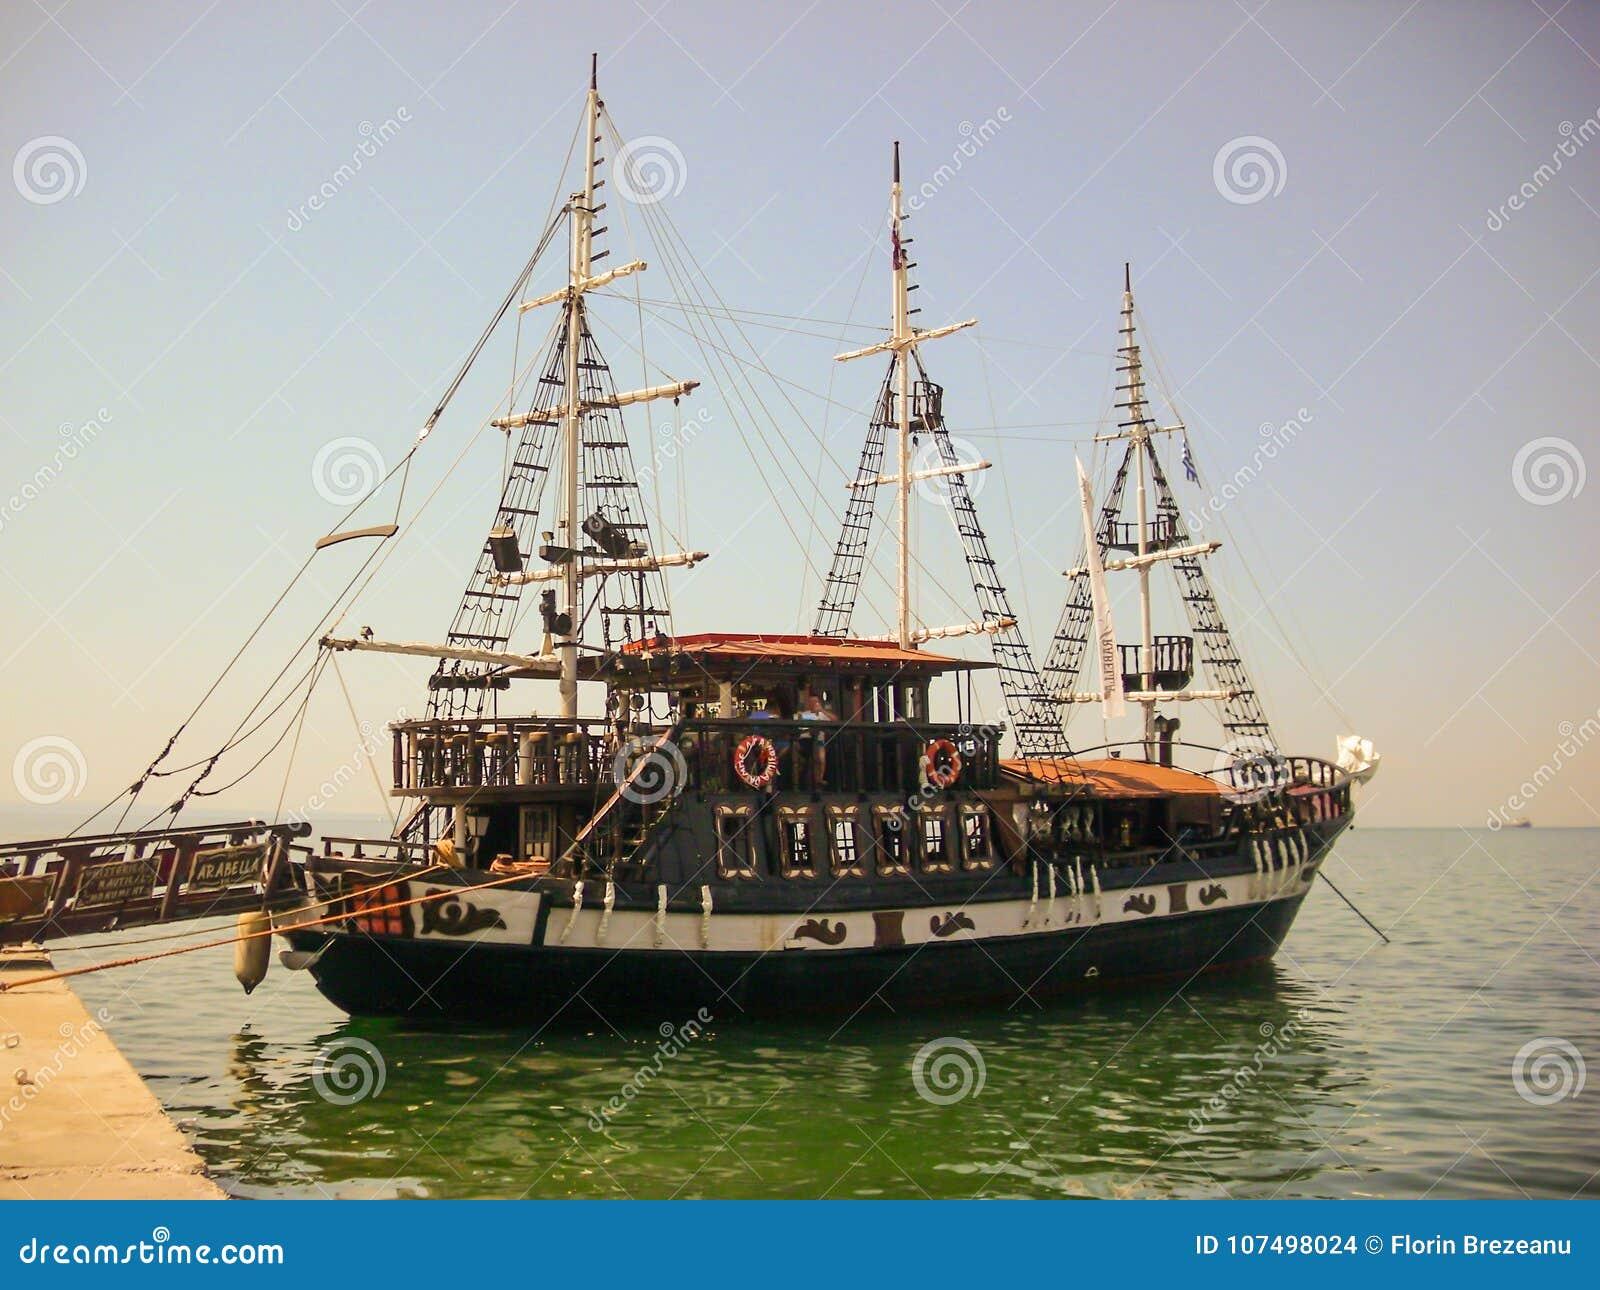 Thessaloniki, Greece - June 07 2014 : Arabella boat waiting for tourists in Thessaloniki City, Greece.